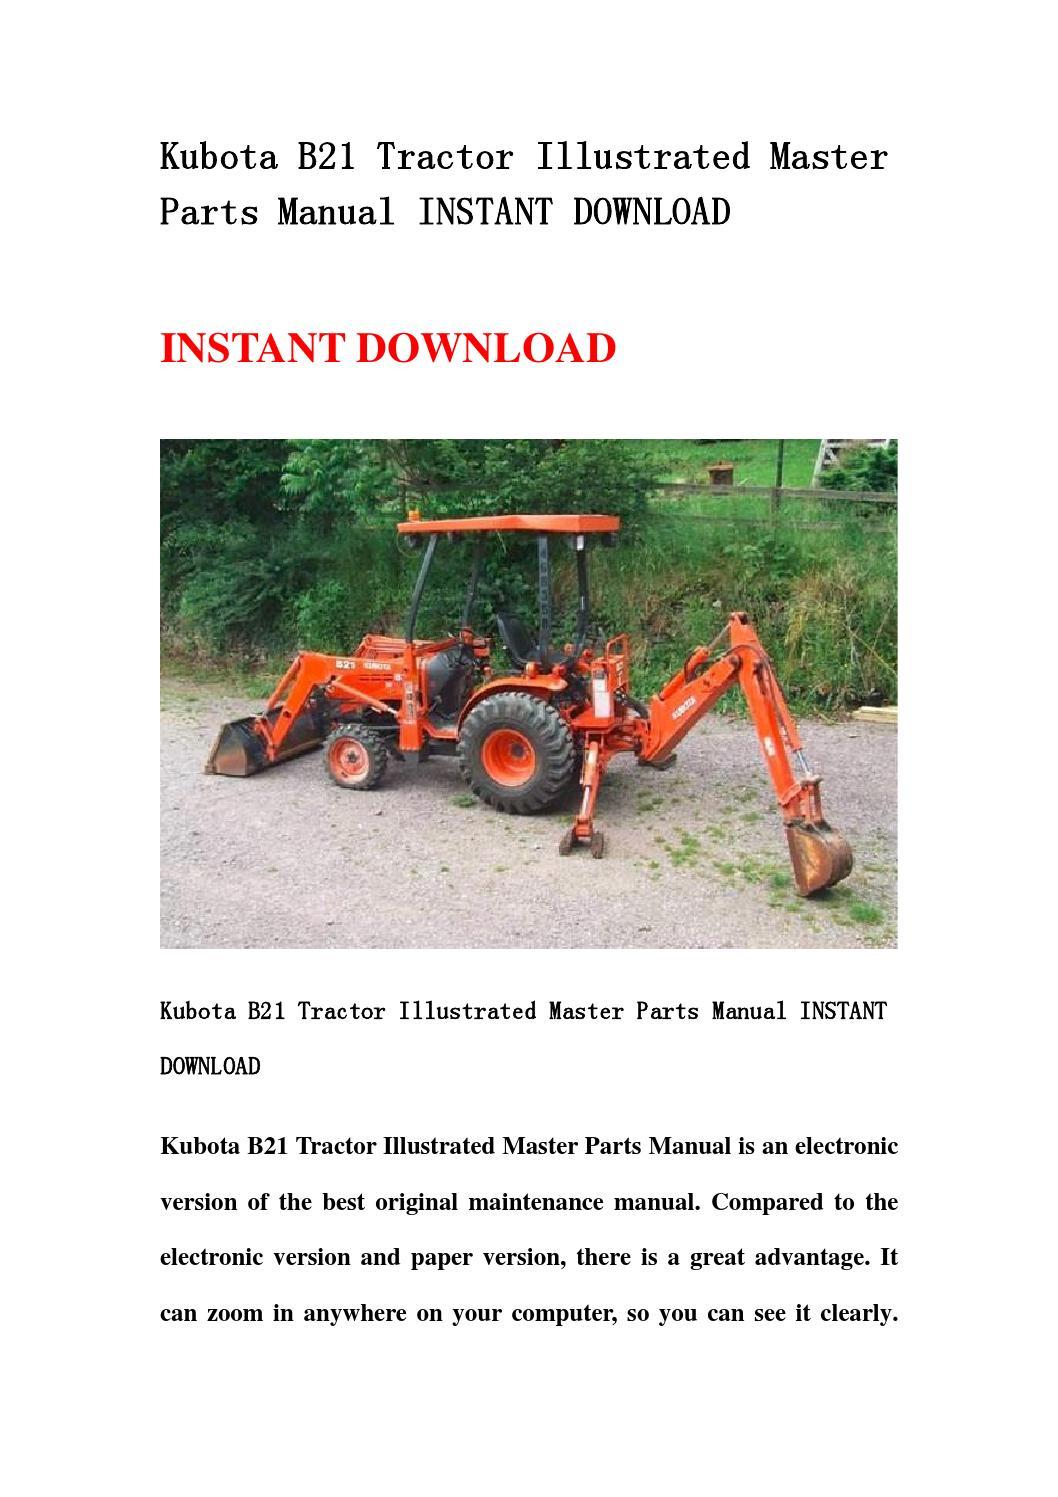 Kubota B21 Tractor Illustrated Master Parts Manual Instant